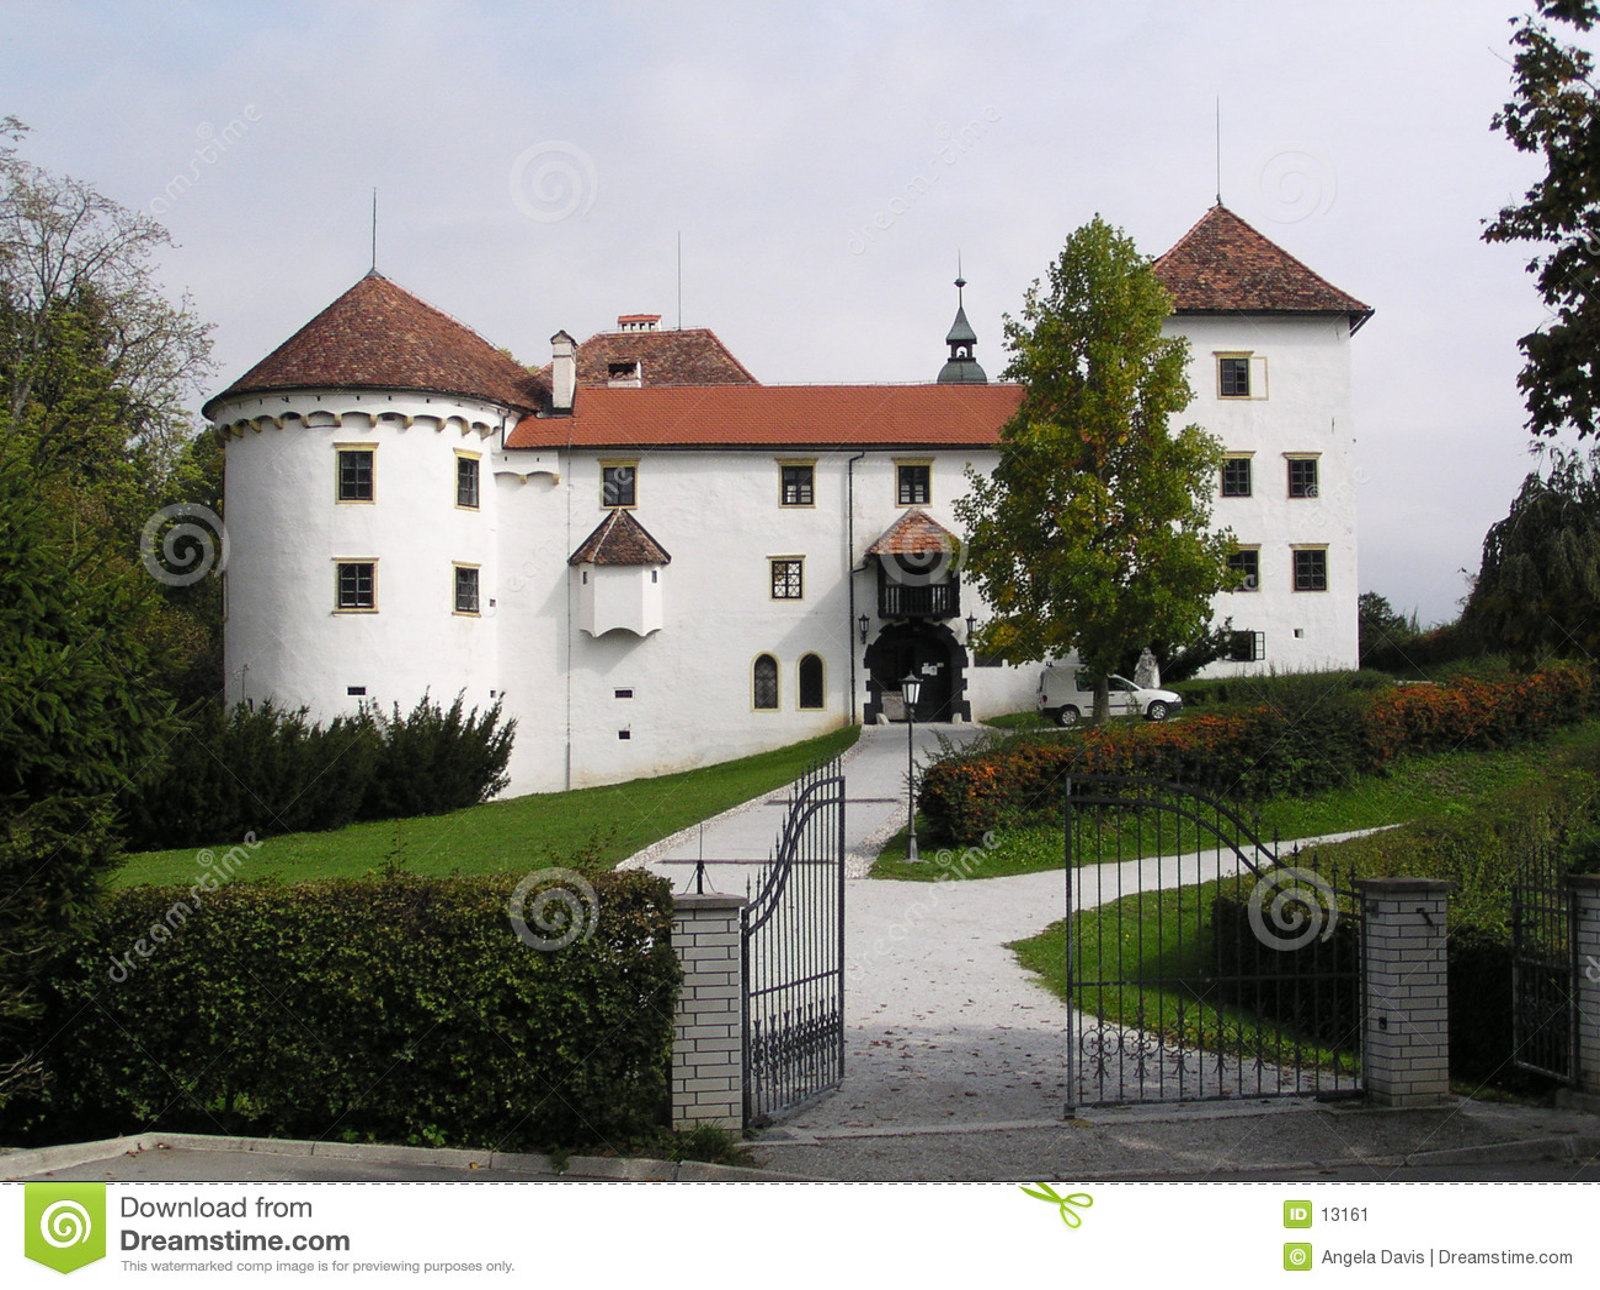 Castle (Slovenia)